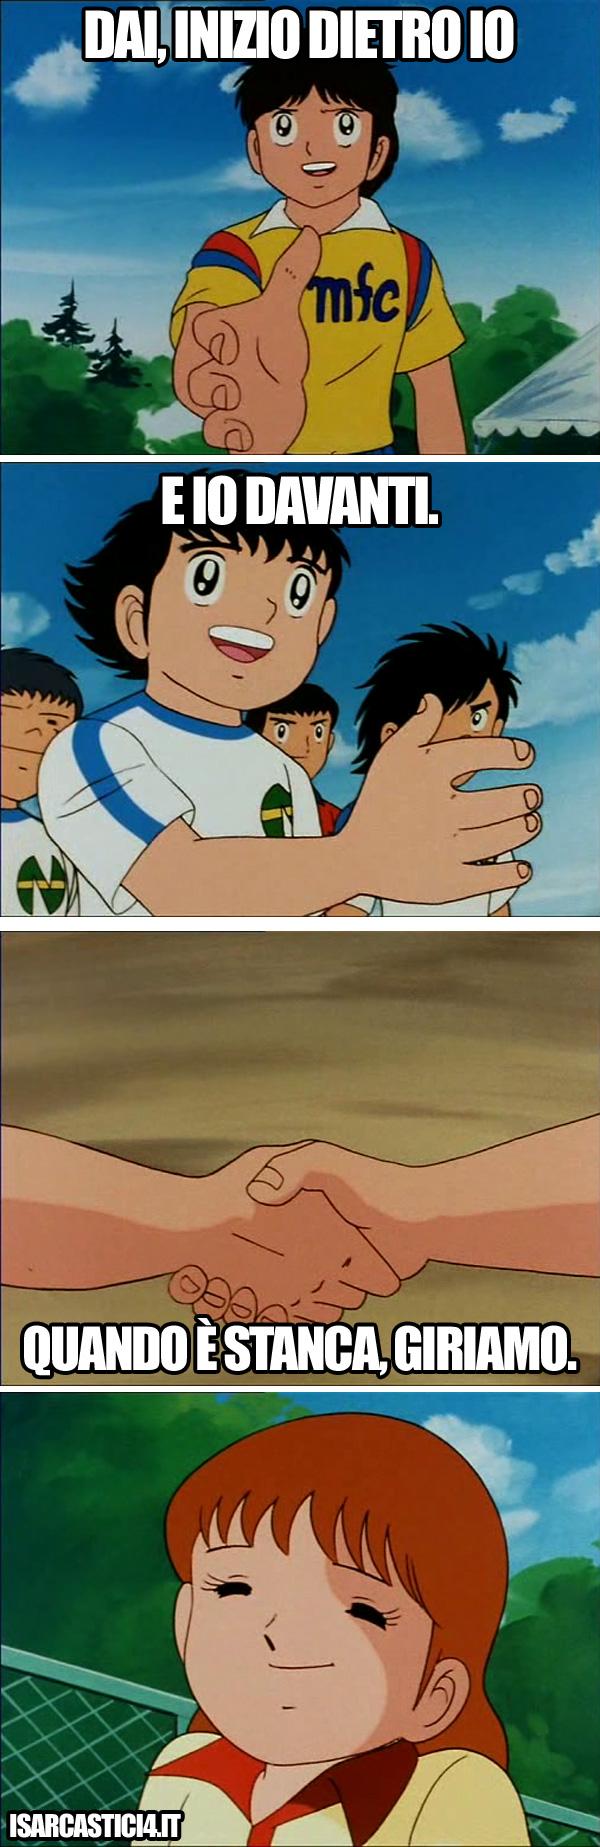 Holly & Benji, Capitan Tsubasa meme ita - Triplete